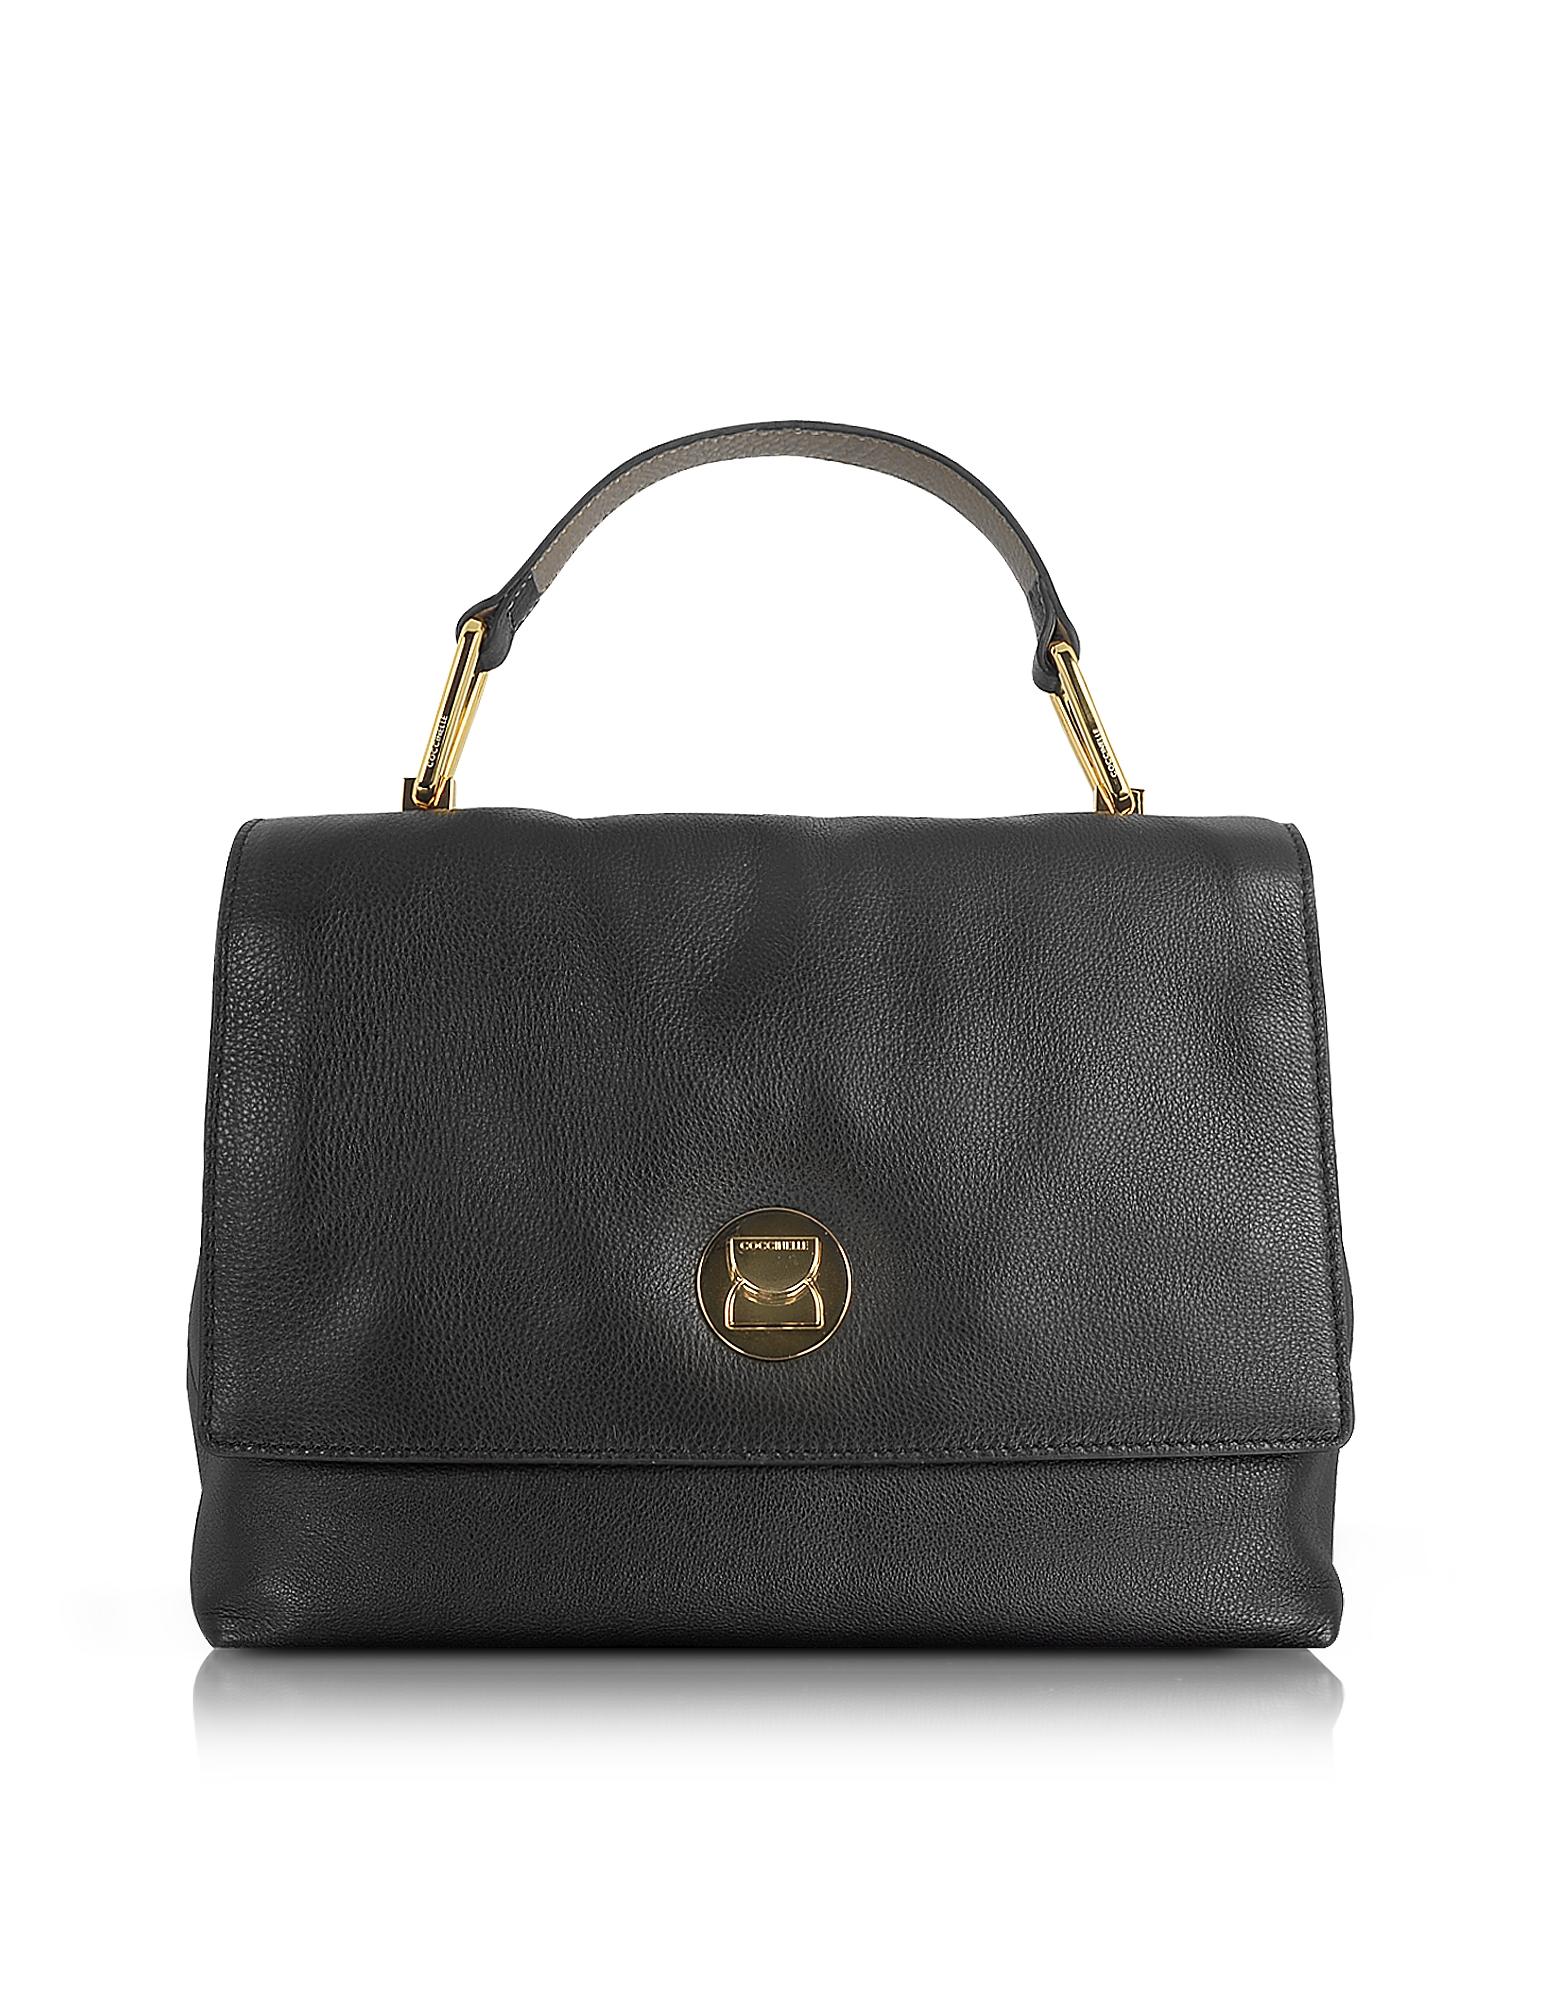 Coccinelle Liya Black Grainy Leather Satchel Bag